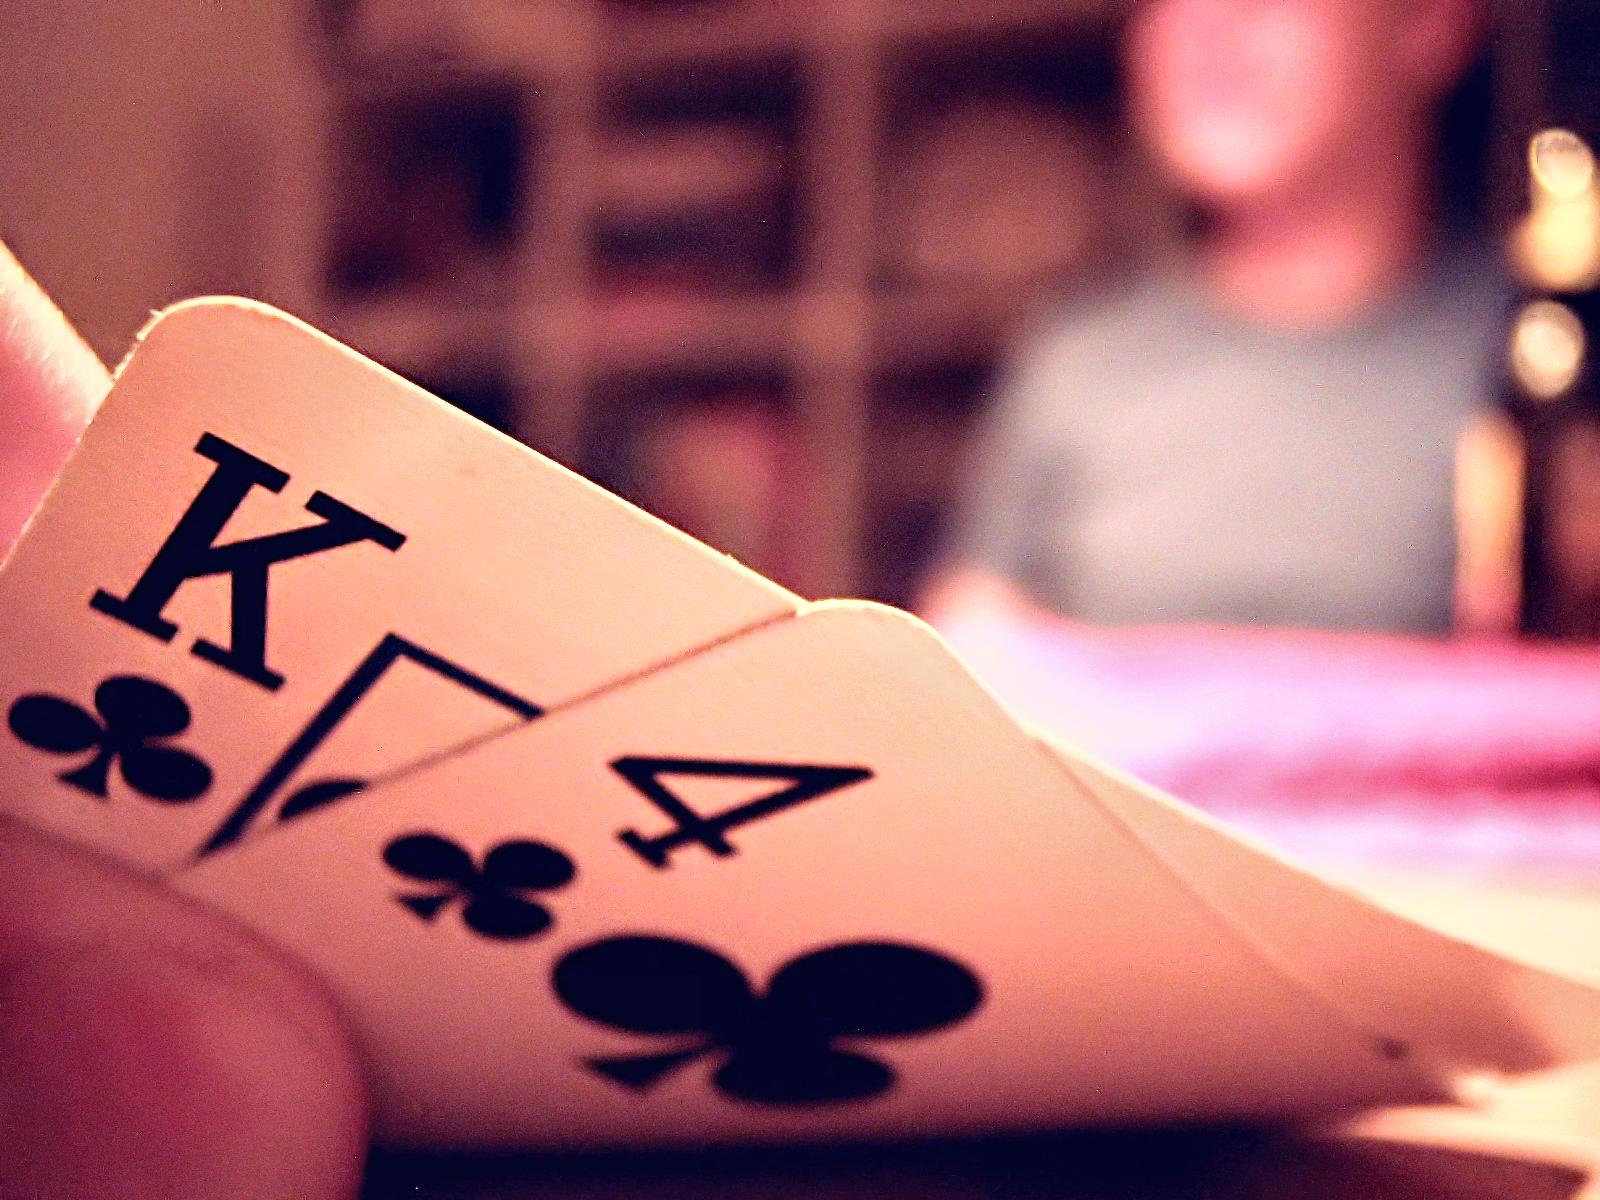 texas_hold_em_hole_cards